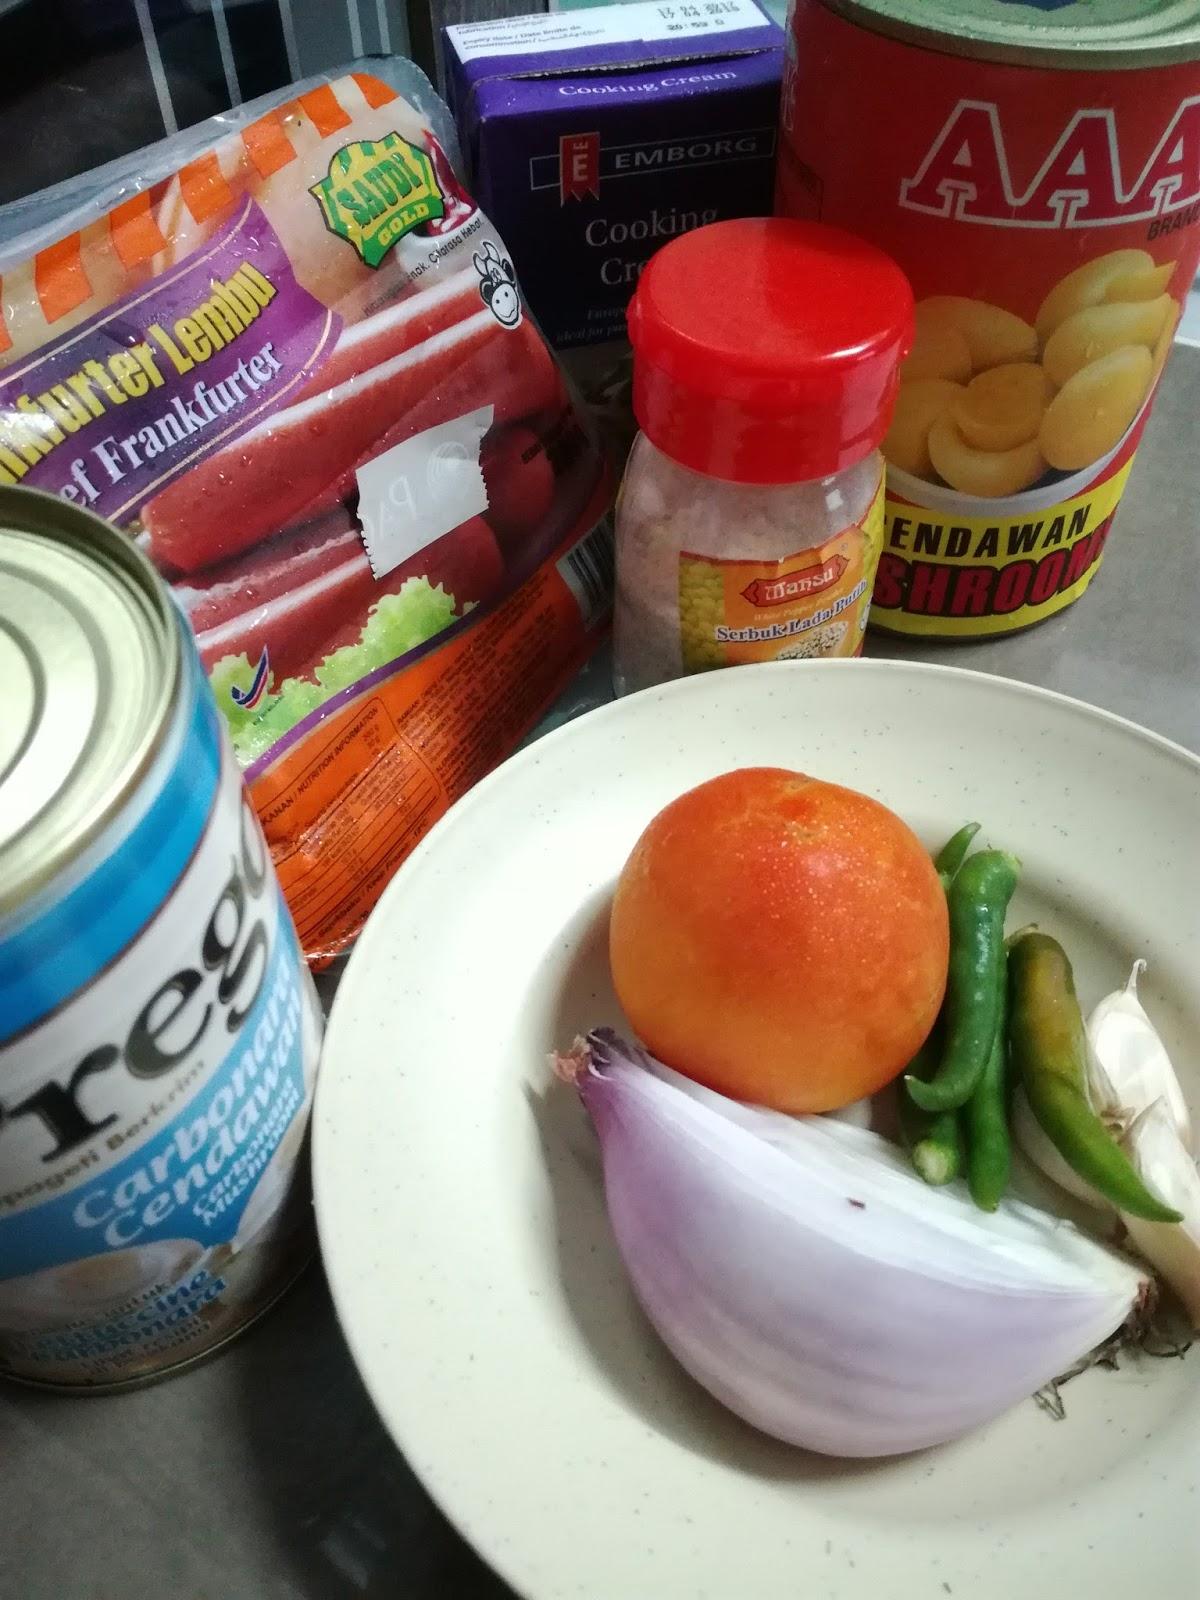 Resepi mudah spaghetti carbonara bersama cili padi pedas terangkat